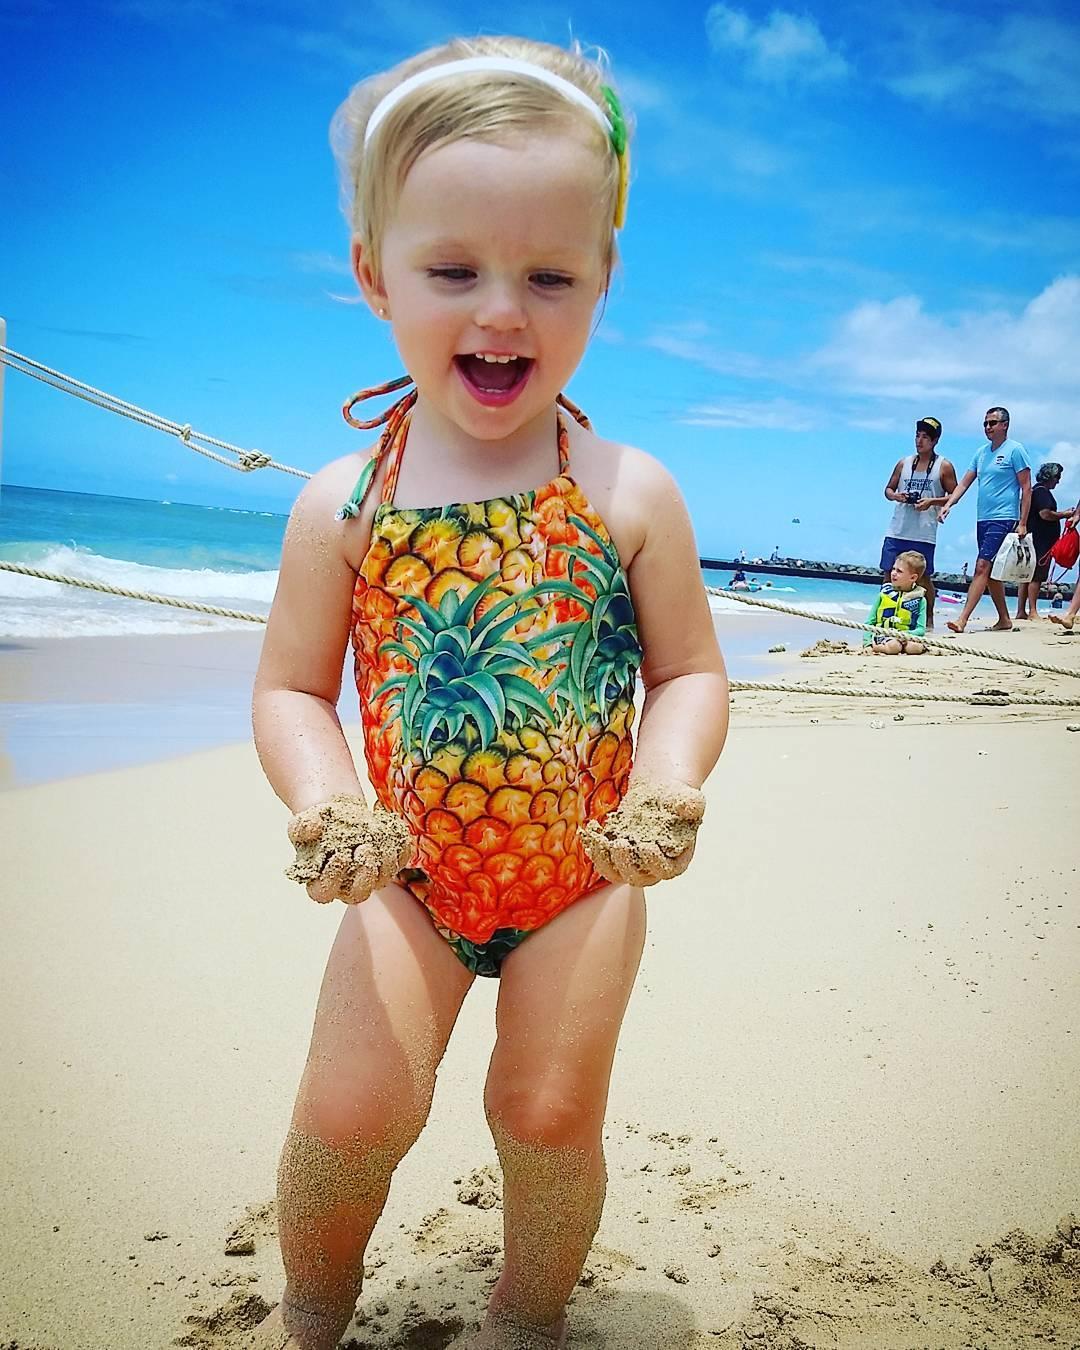 2018 Pineapple Girls Kids Swimming Costume Bikini Set Bathing Sleeveless Bodysuit Pineapple Swimsuit Swimwear Clothing 1 6Y-in Bodysuits from Mother u0026 Kids ...  sc 1 st  AliExpress.com & 2018 Pineapple Girls Kids Swimming Costume Bikini Set Bathing ...